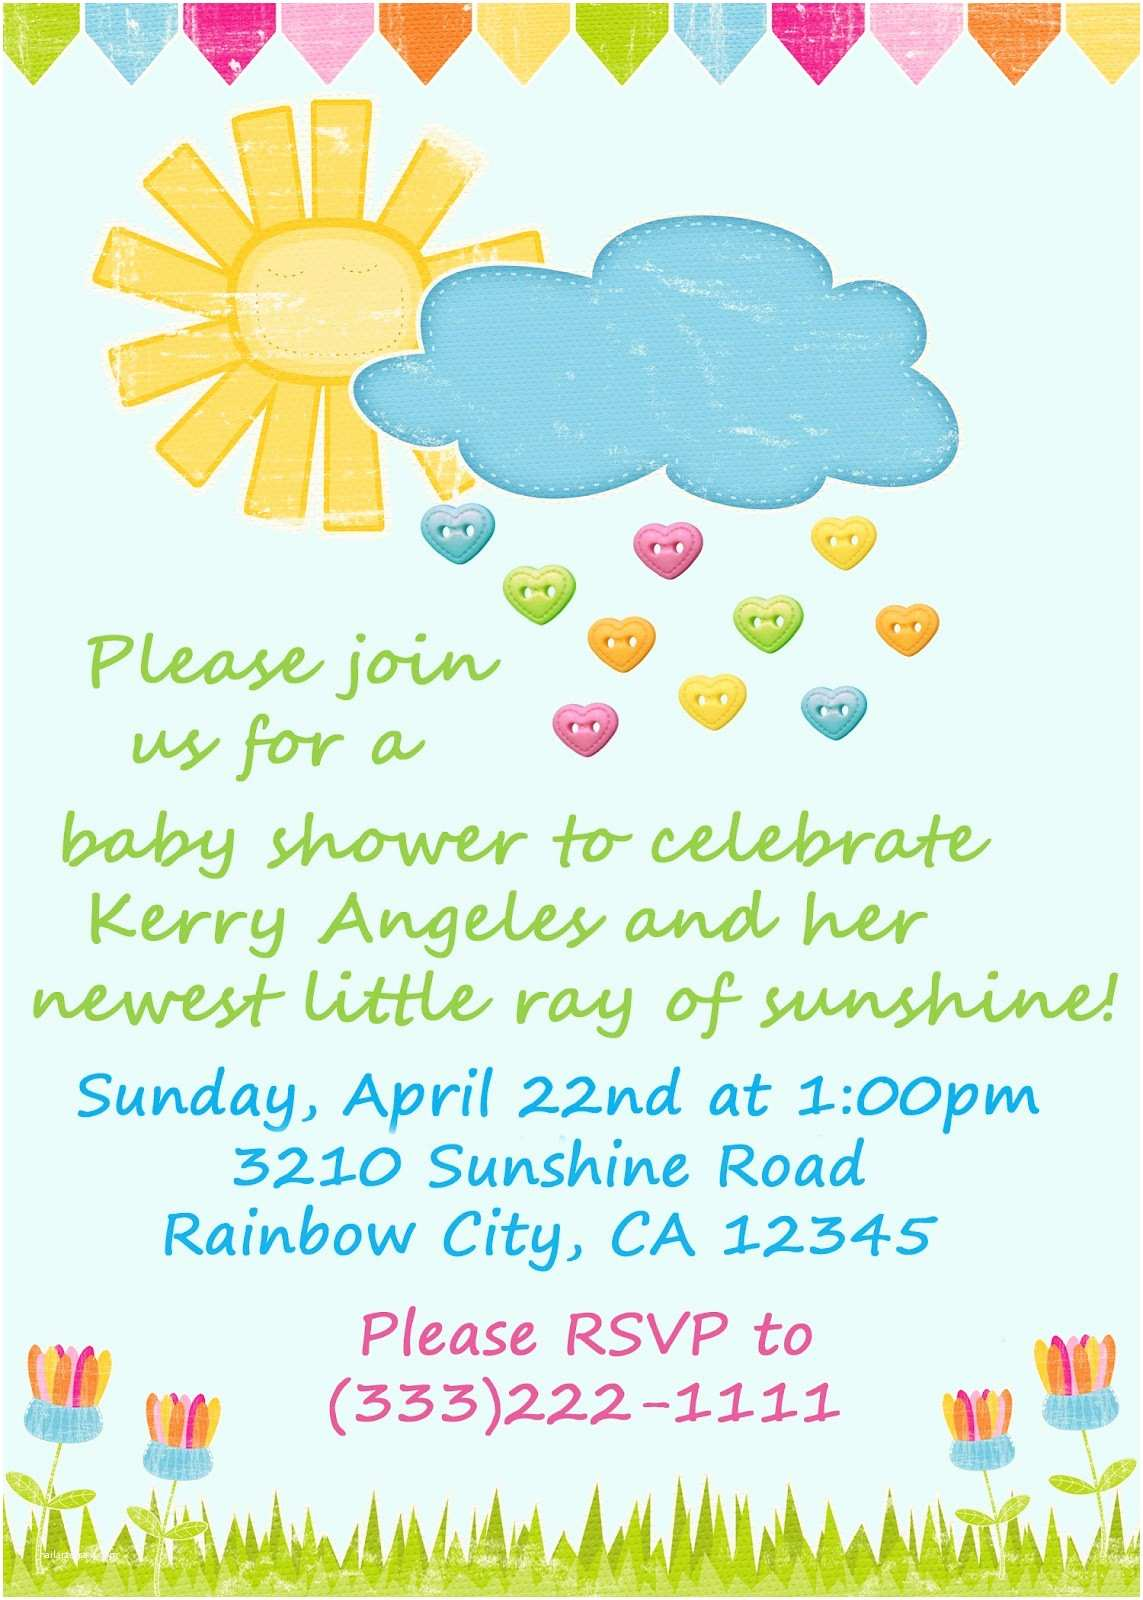 Baby Shower Invitation Ideas Capturing Creativity Going Digital Baby Shower